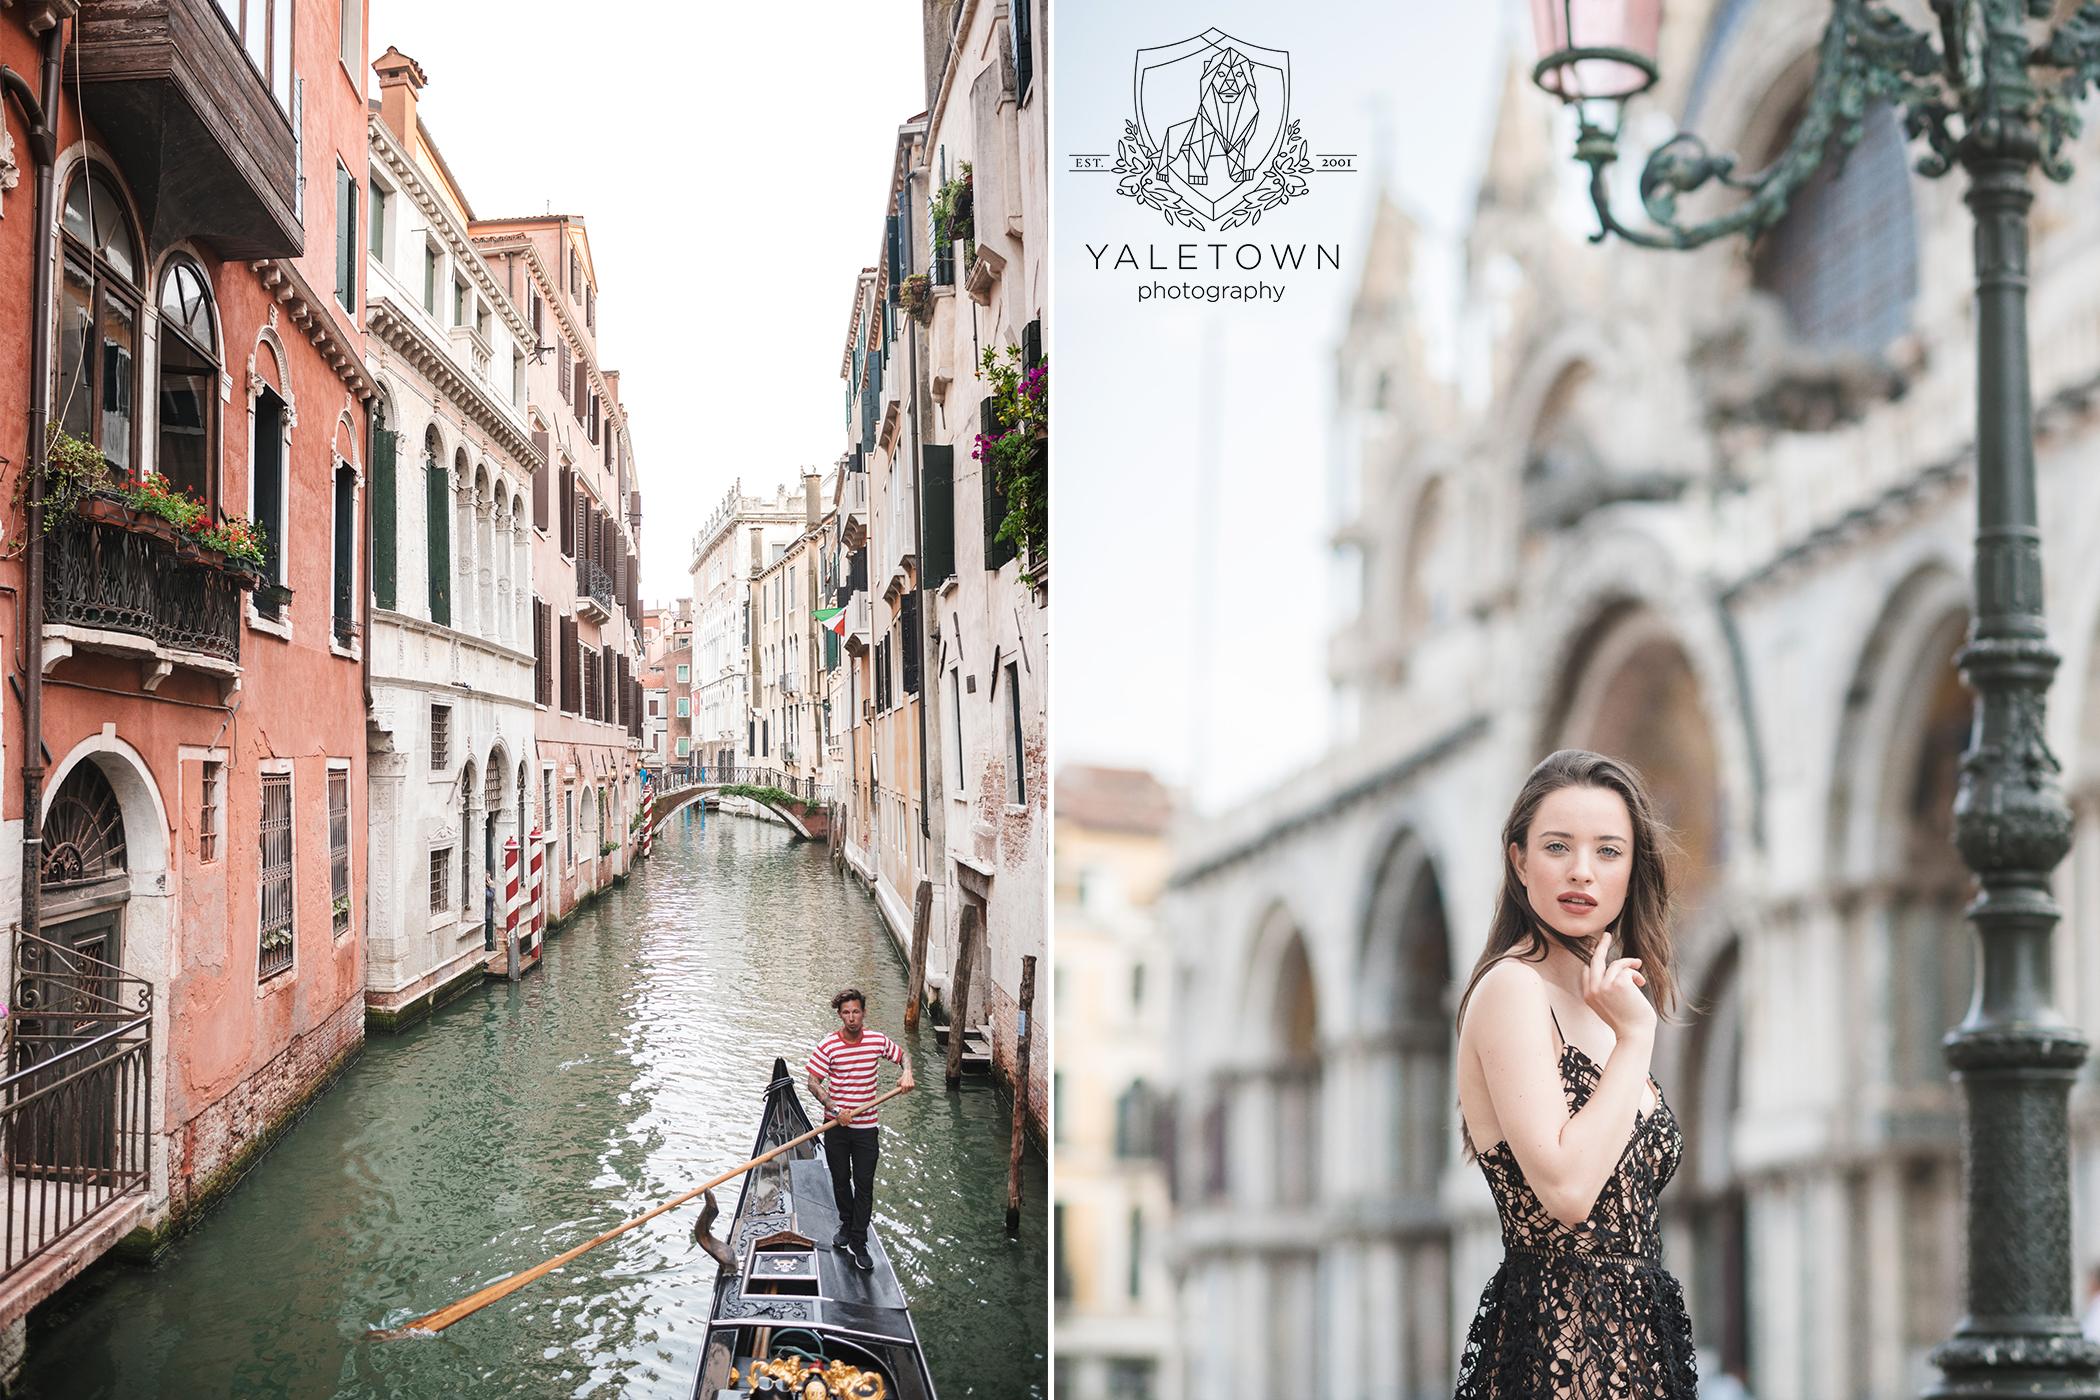 Venice-portrait-session-yaletown-photography-vacation-photographer-photo-006.jpg